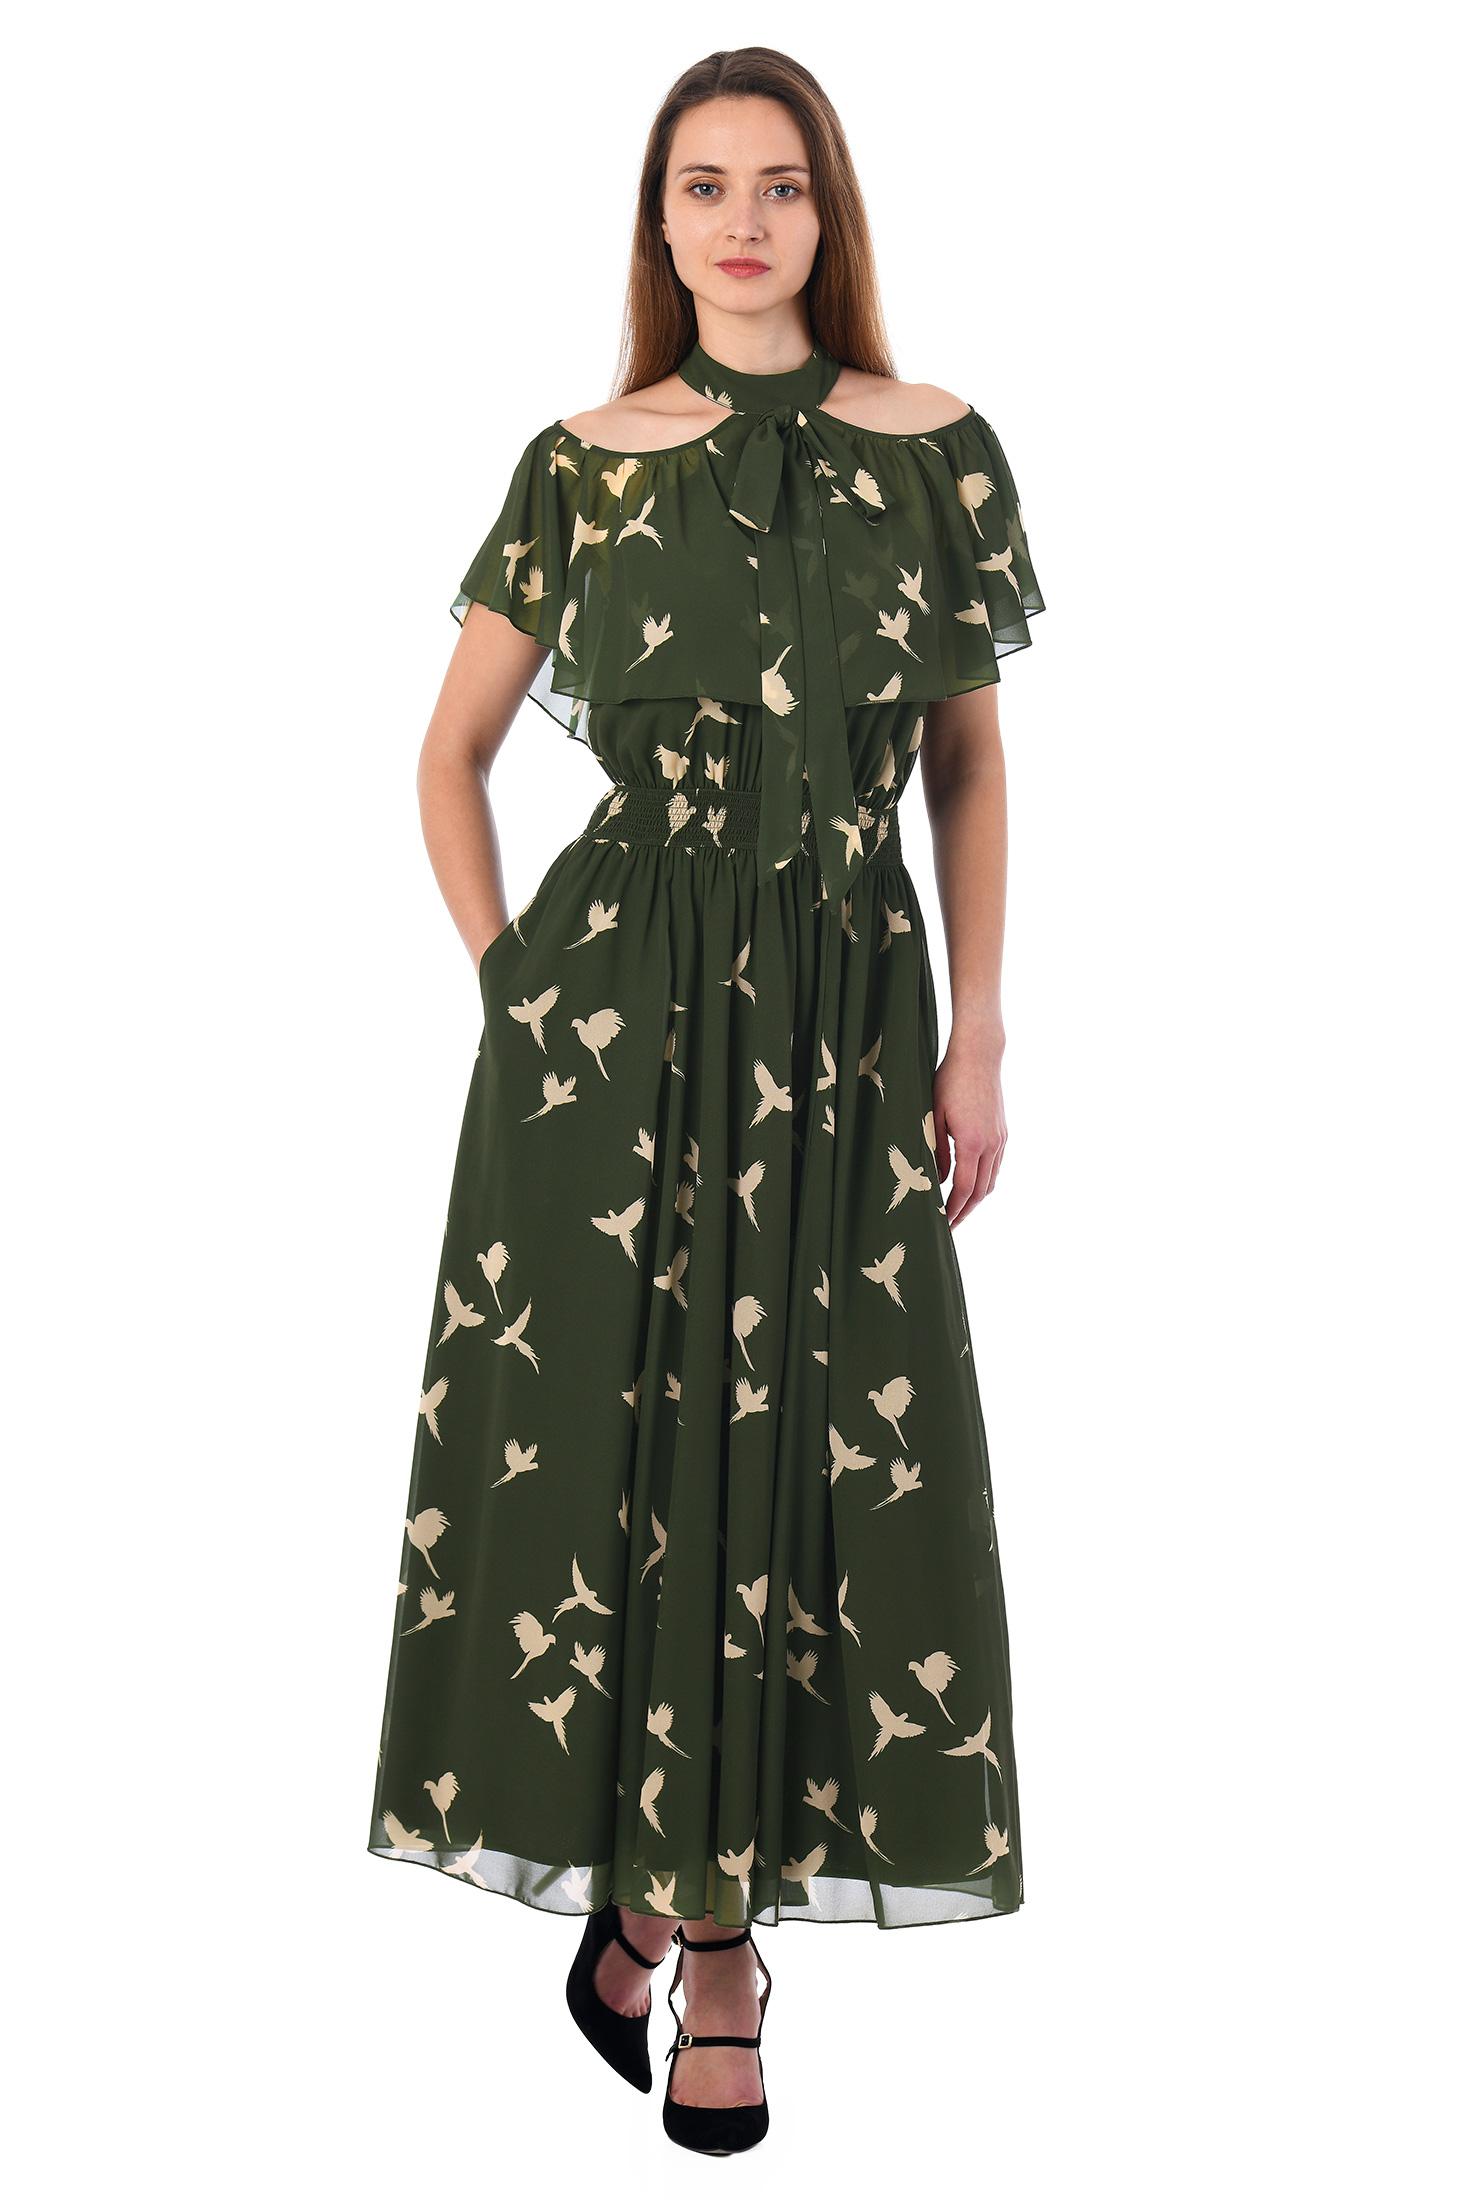 eShakti Women's Ruffle cold shoulder bird print georgette dress CL0053115